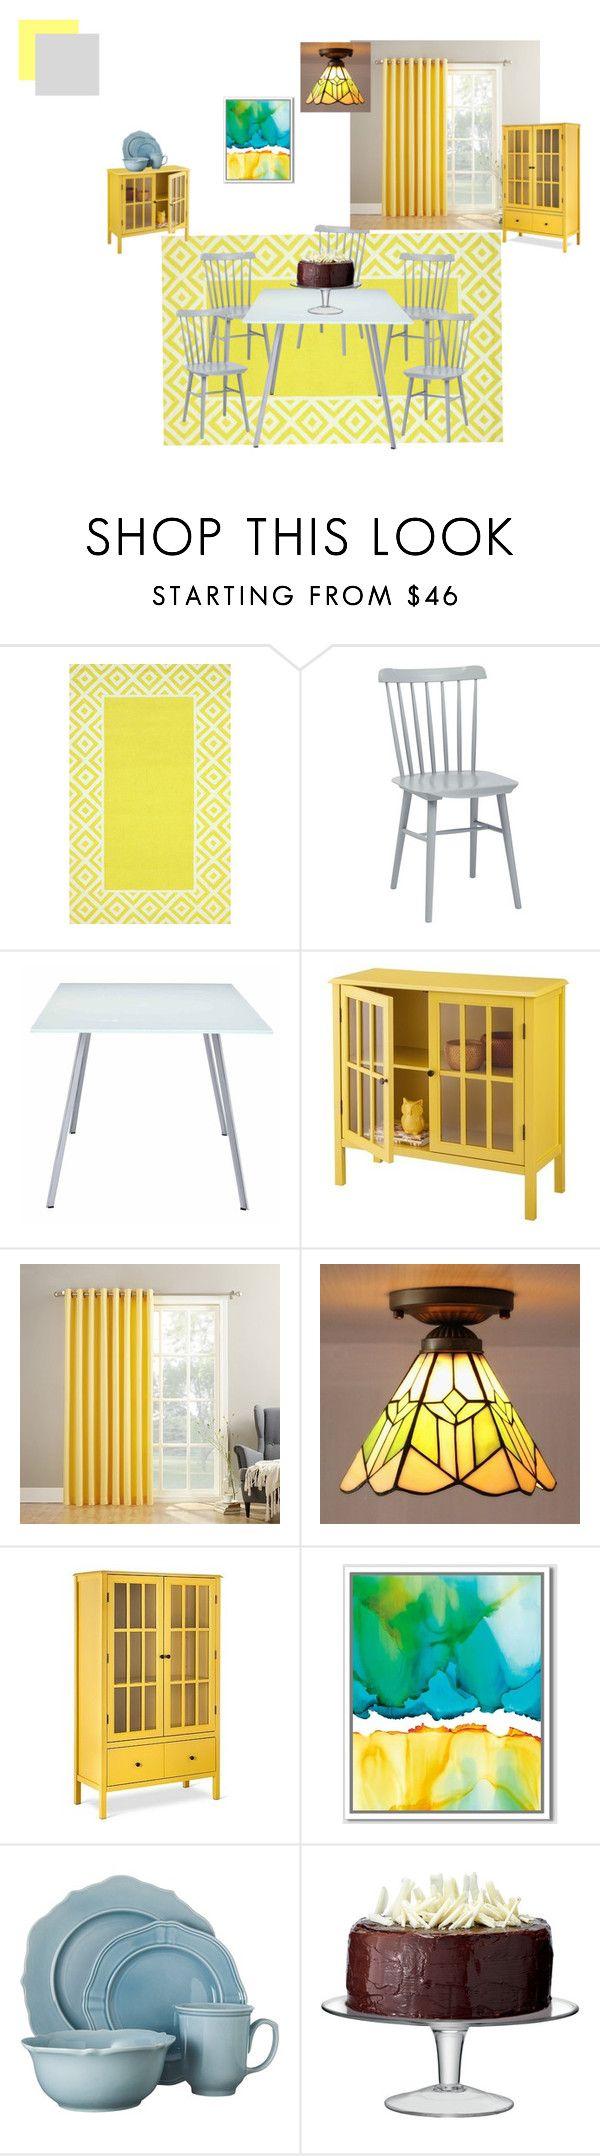 20 best Mobile sala images on Pinterest | Armoires, Arquitetura ...